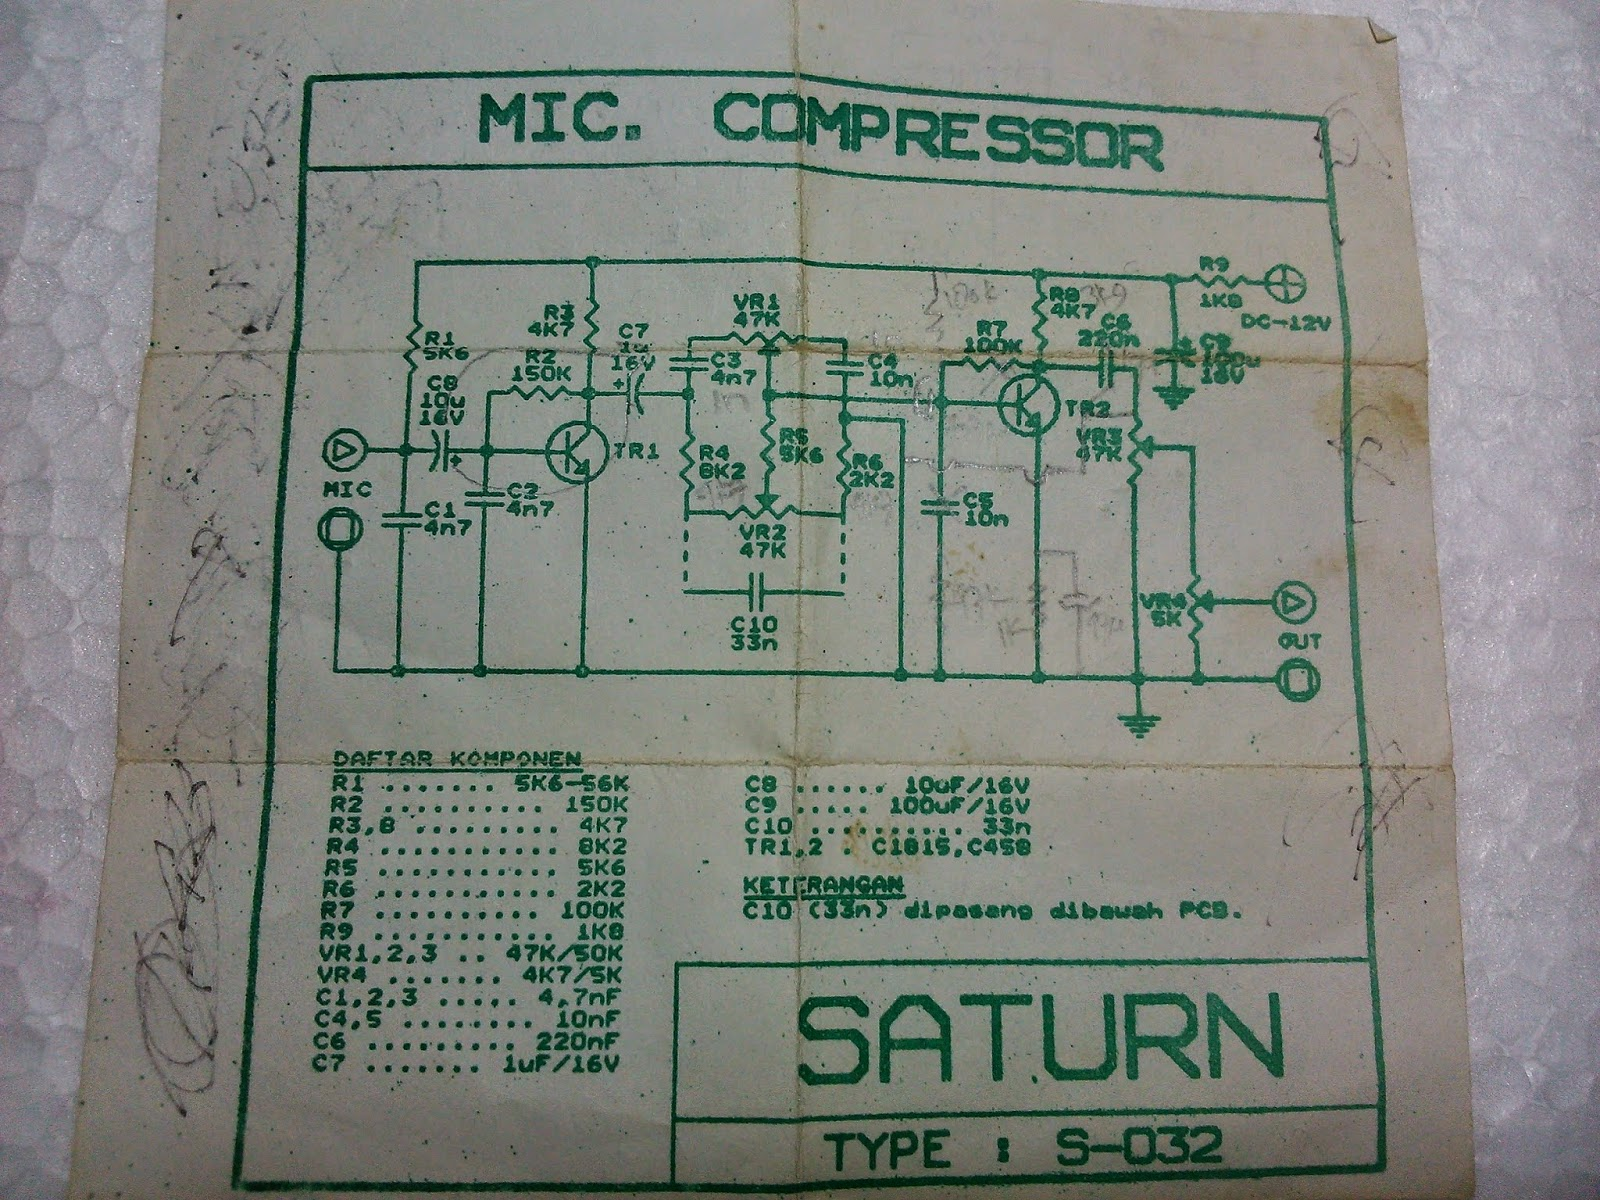 DSC_0219  Watt Amplifier Circuit Diagram on tea 2025 stereo, 1000 watts power, for ic an7135, 1w mos fet, subwoofer audio, 2n3055 power, lm35 analog signal,